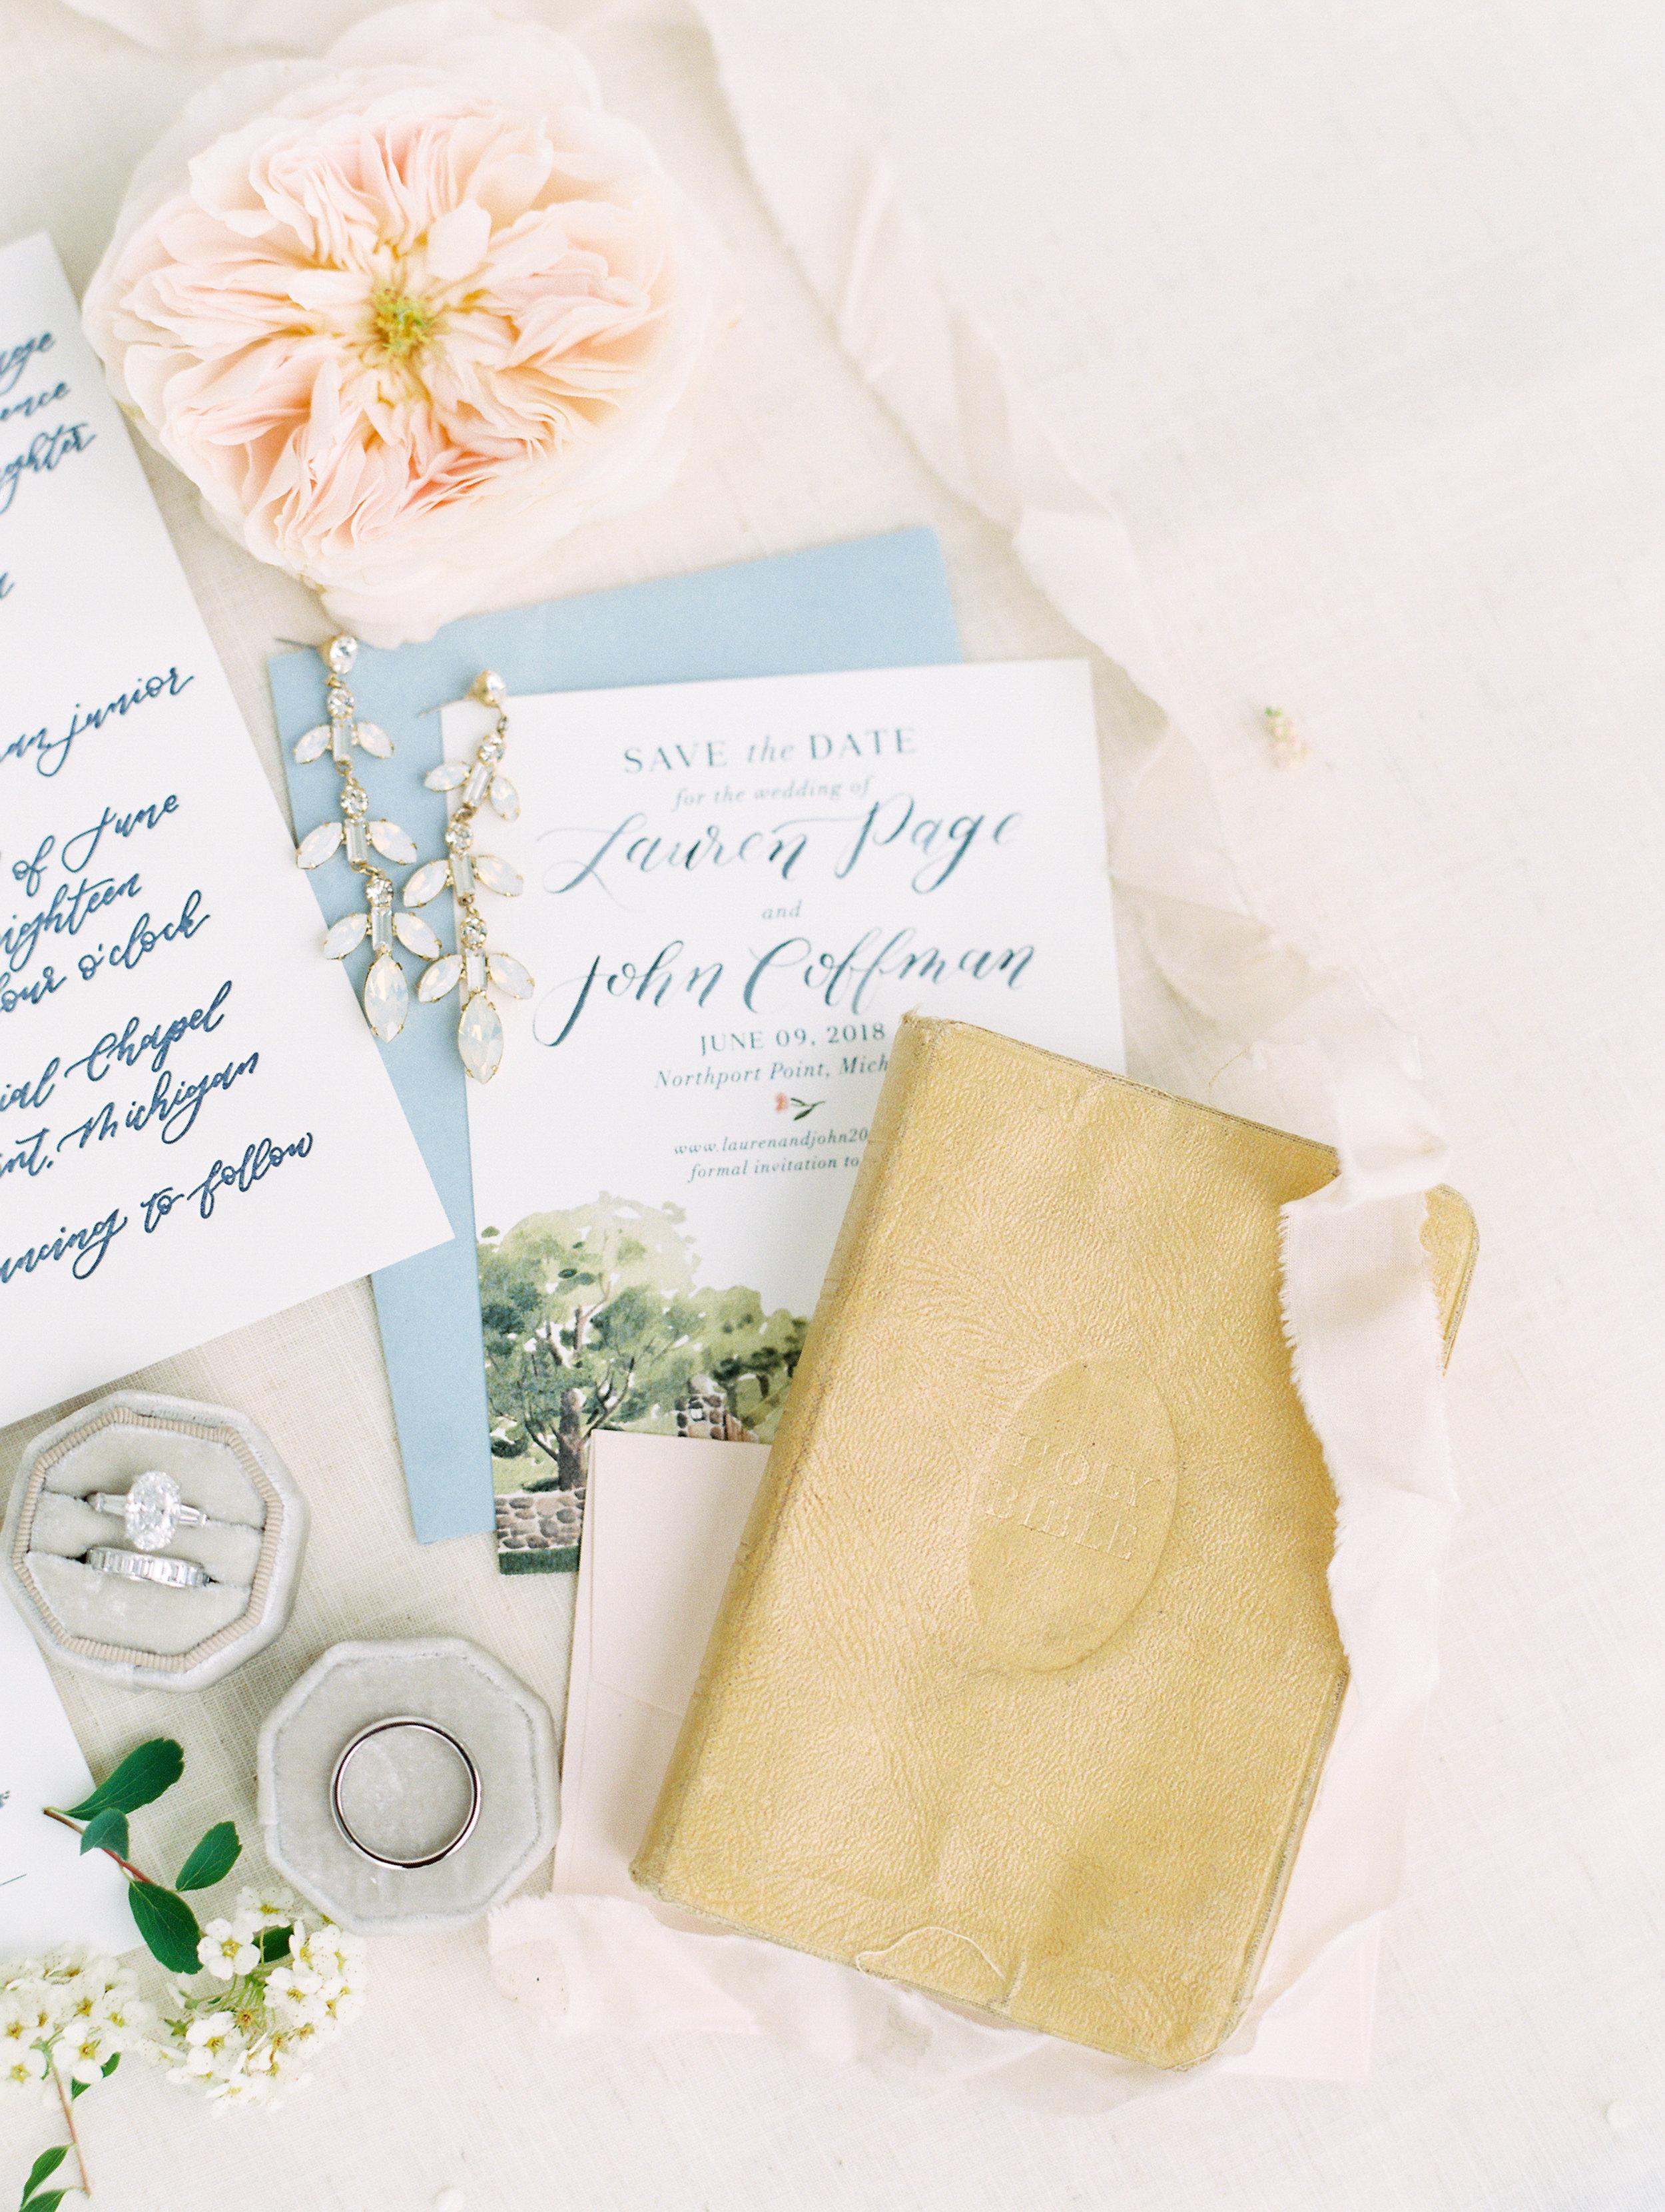 Coffman+Wedding+Details-56.jpg